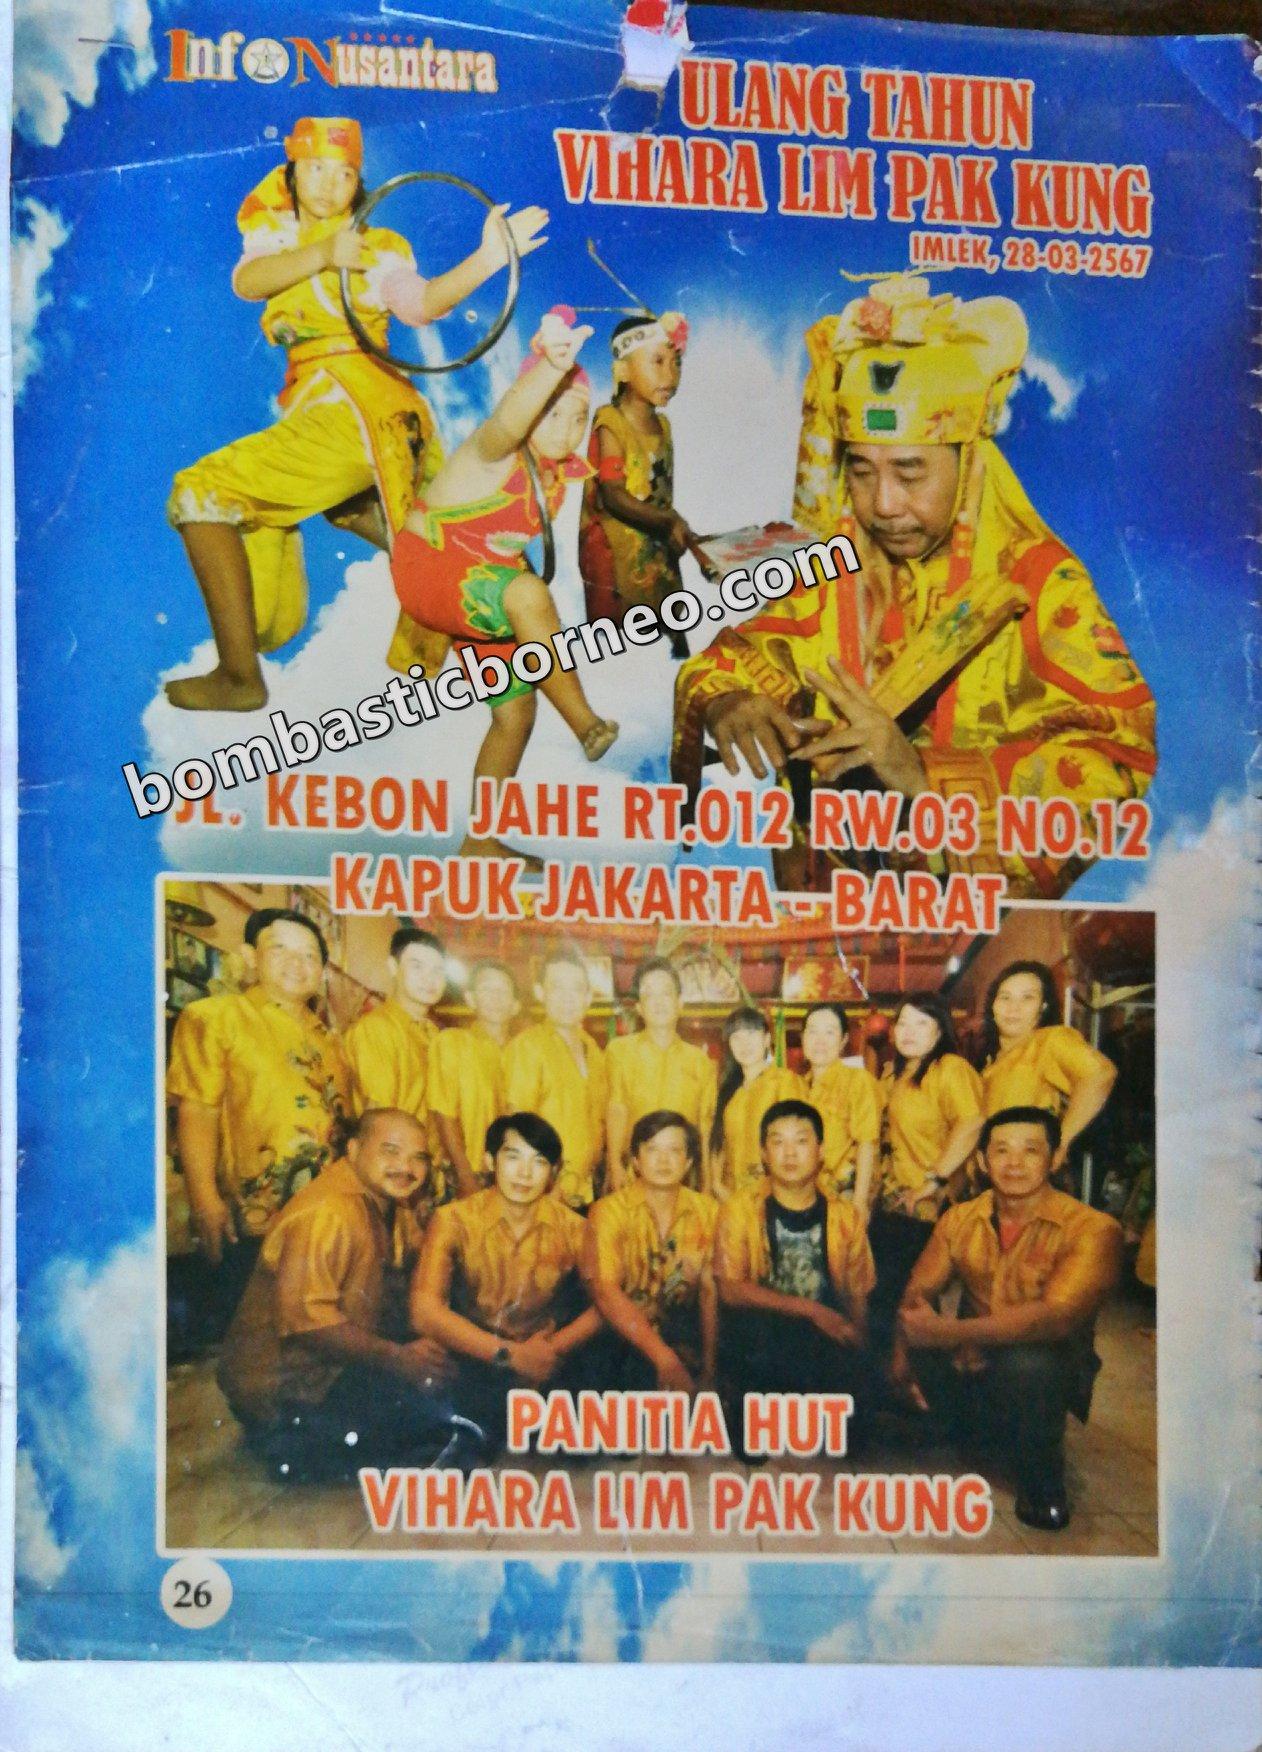 Panglima, healer, Dukun, Sufu, Shaman, Siang Lim, Kalimantan Barat, Borneo, 印度尼西亚法師祭司